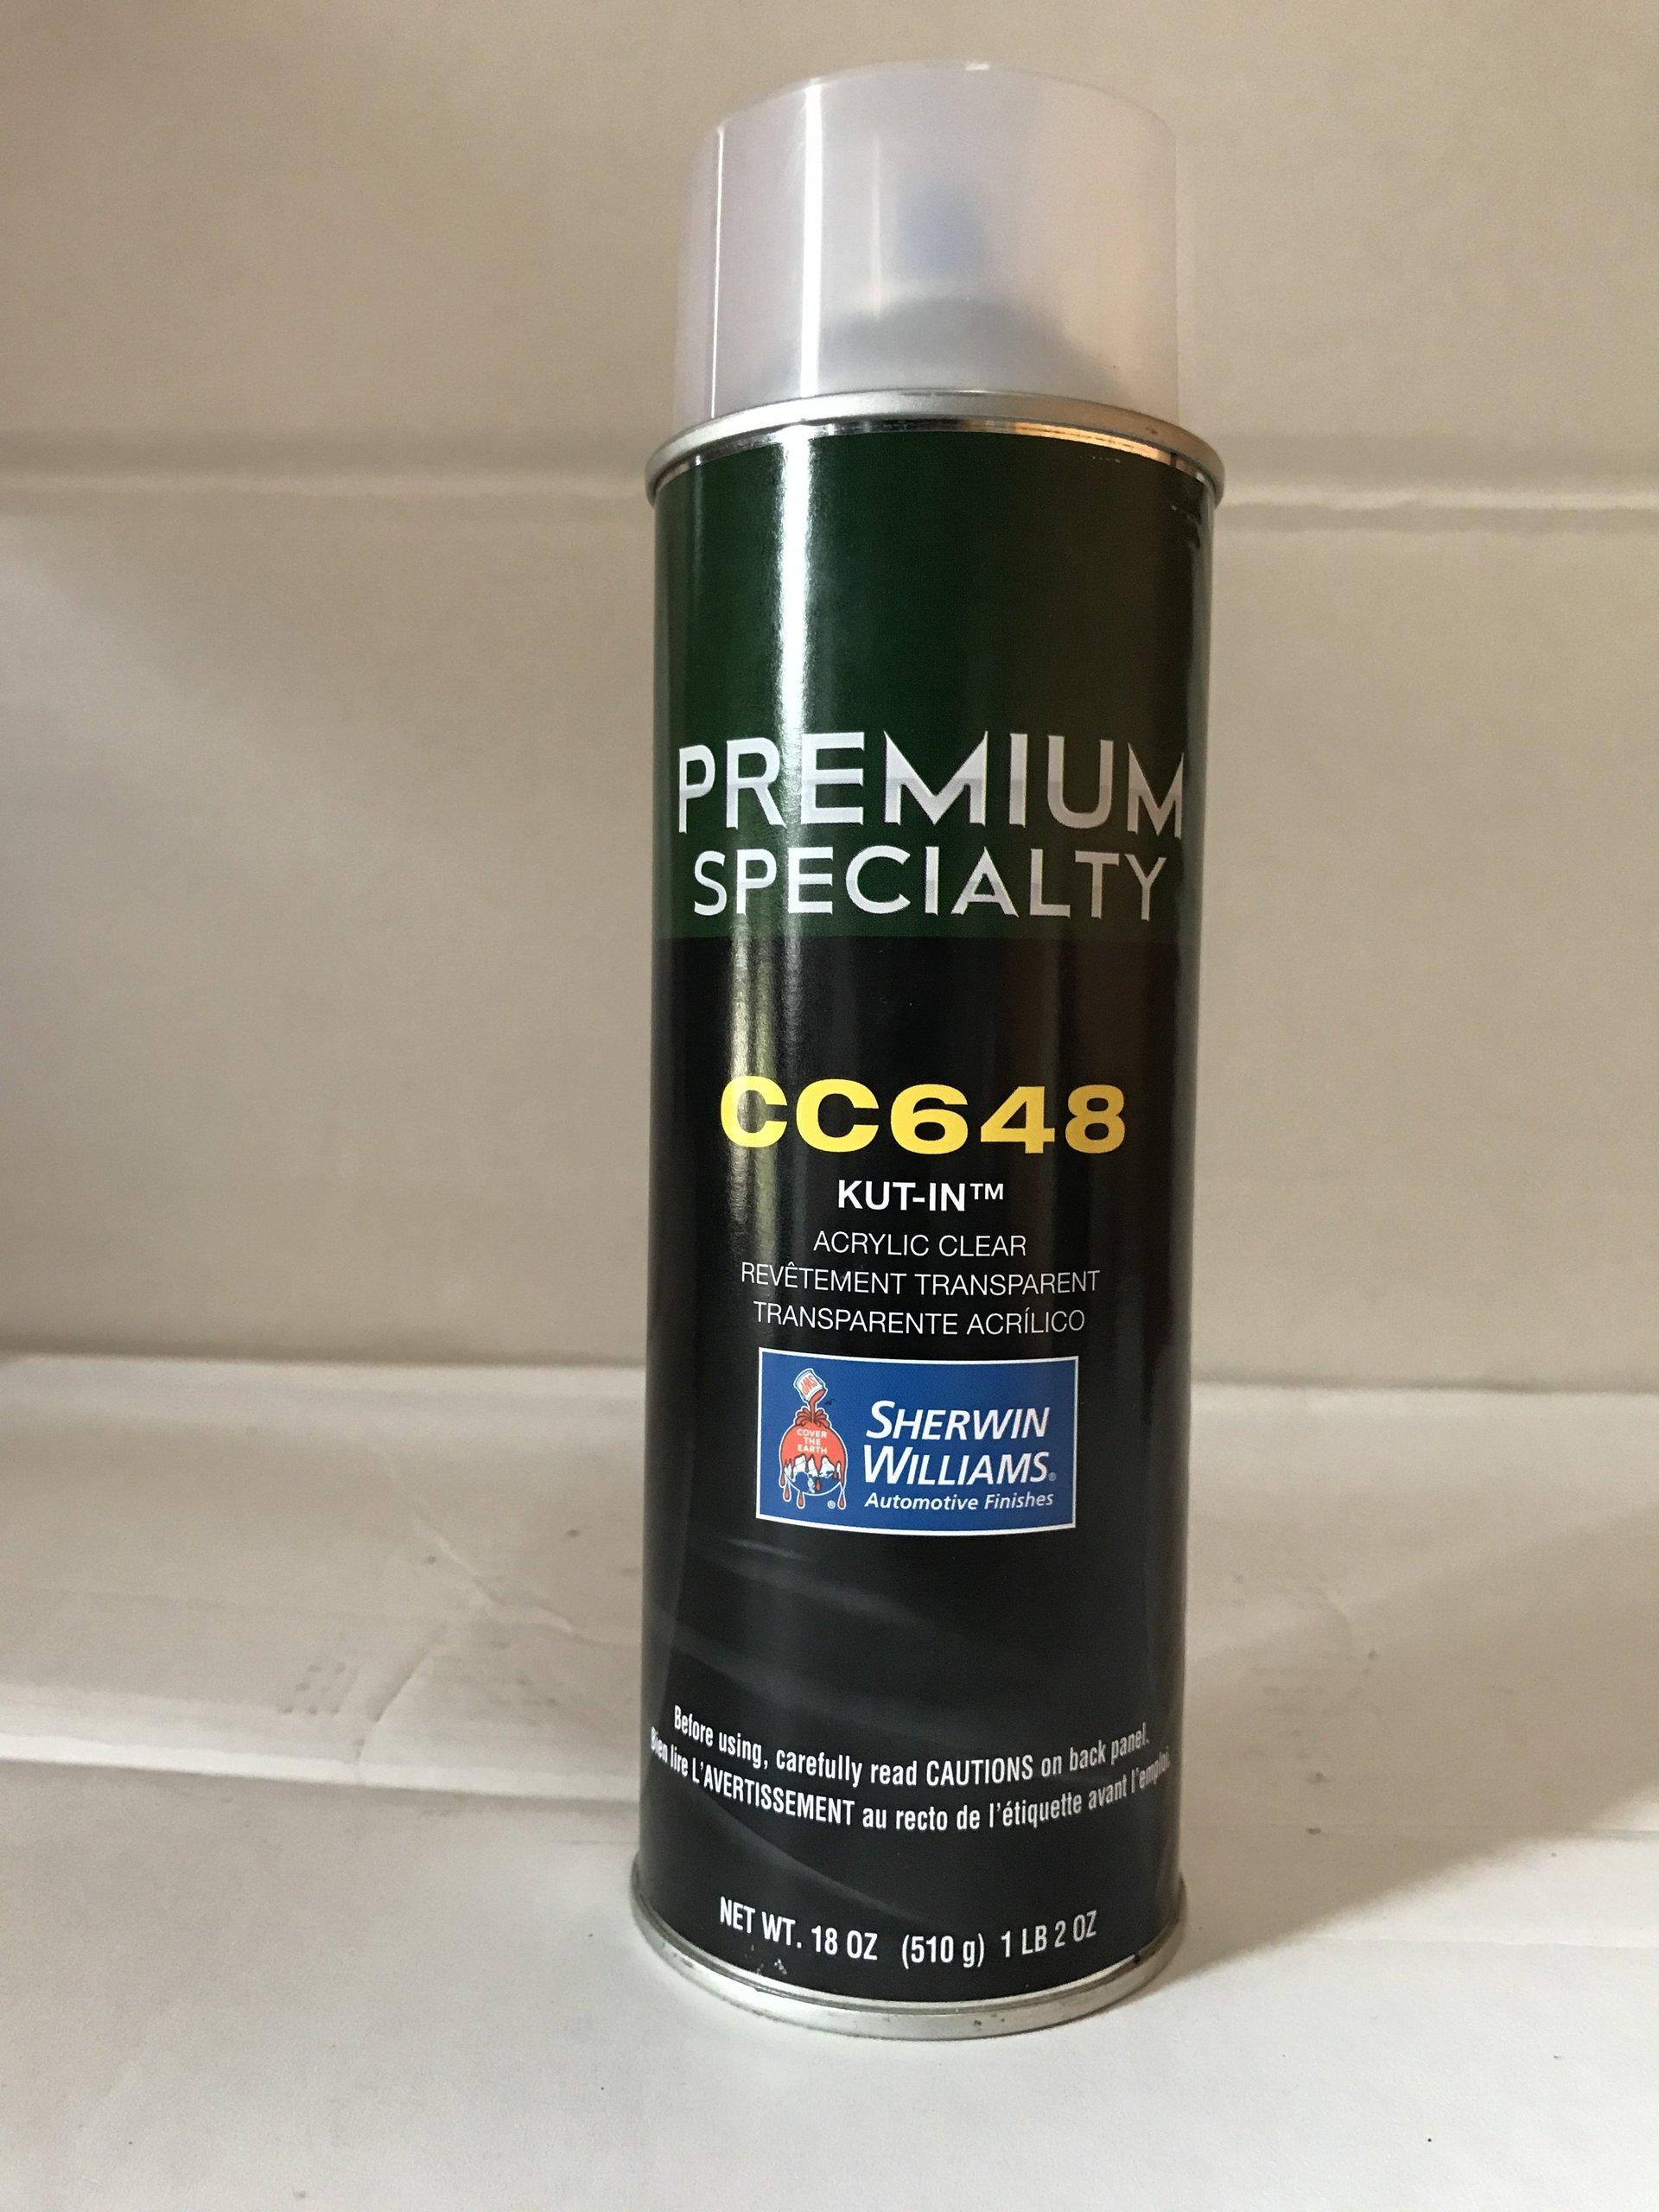 CC648 KUT IN ACRYLIC CLEAR